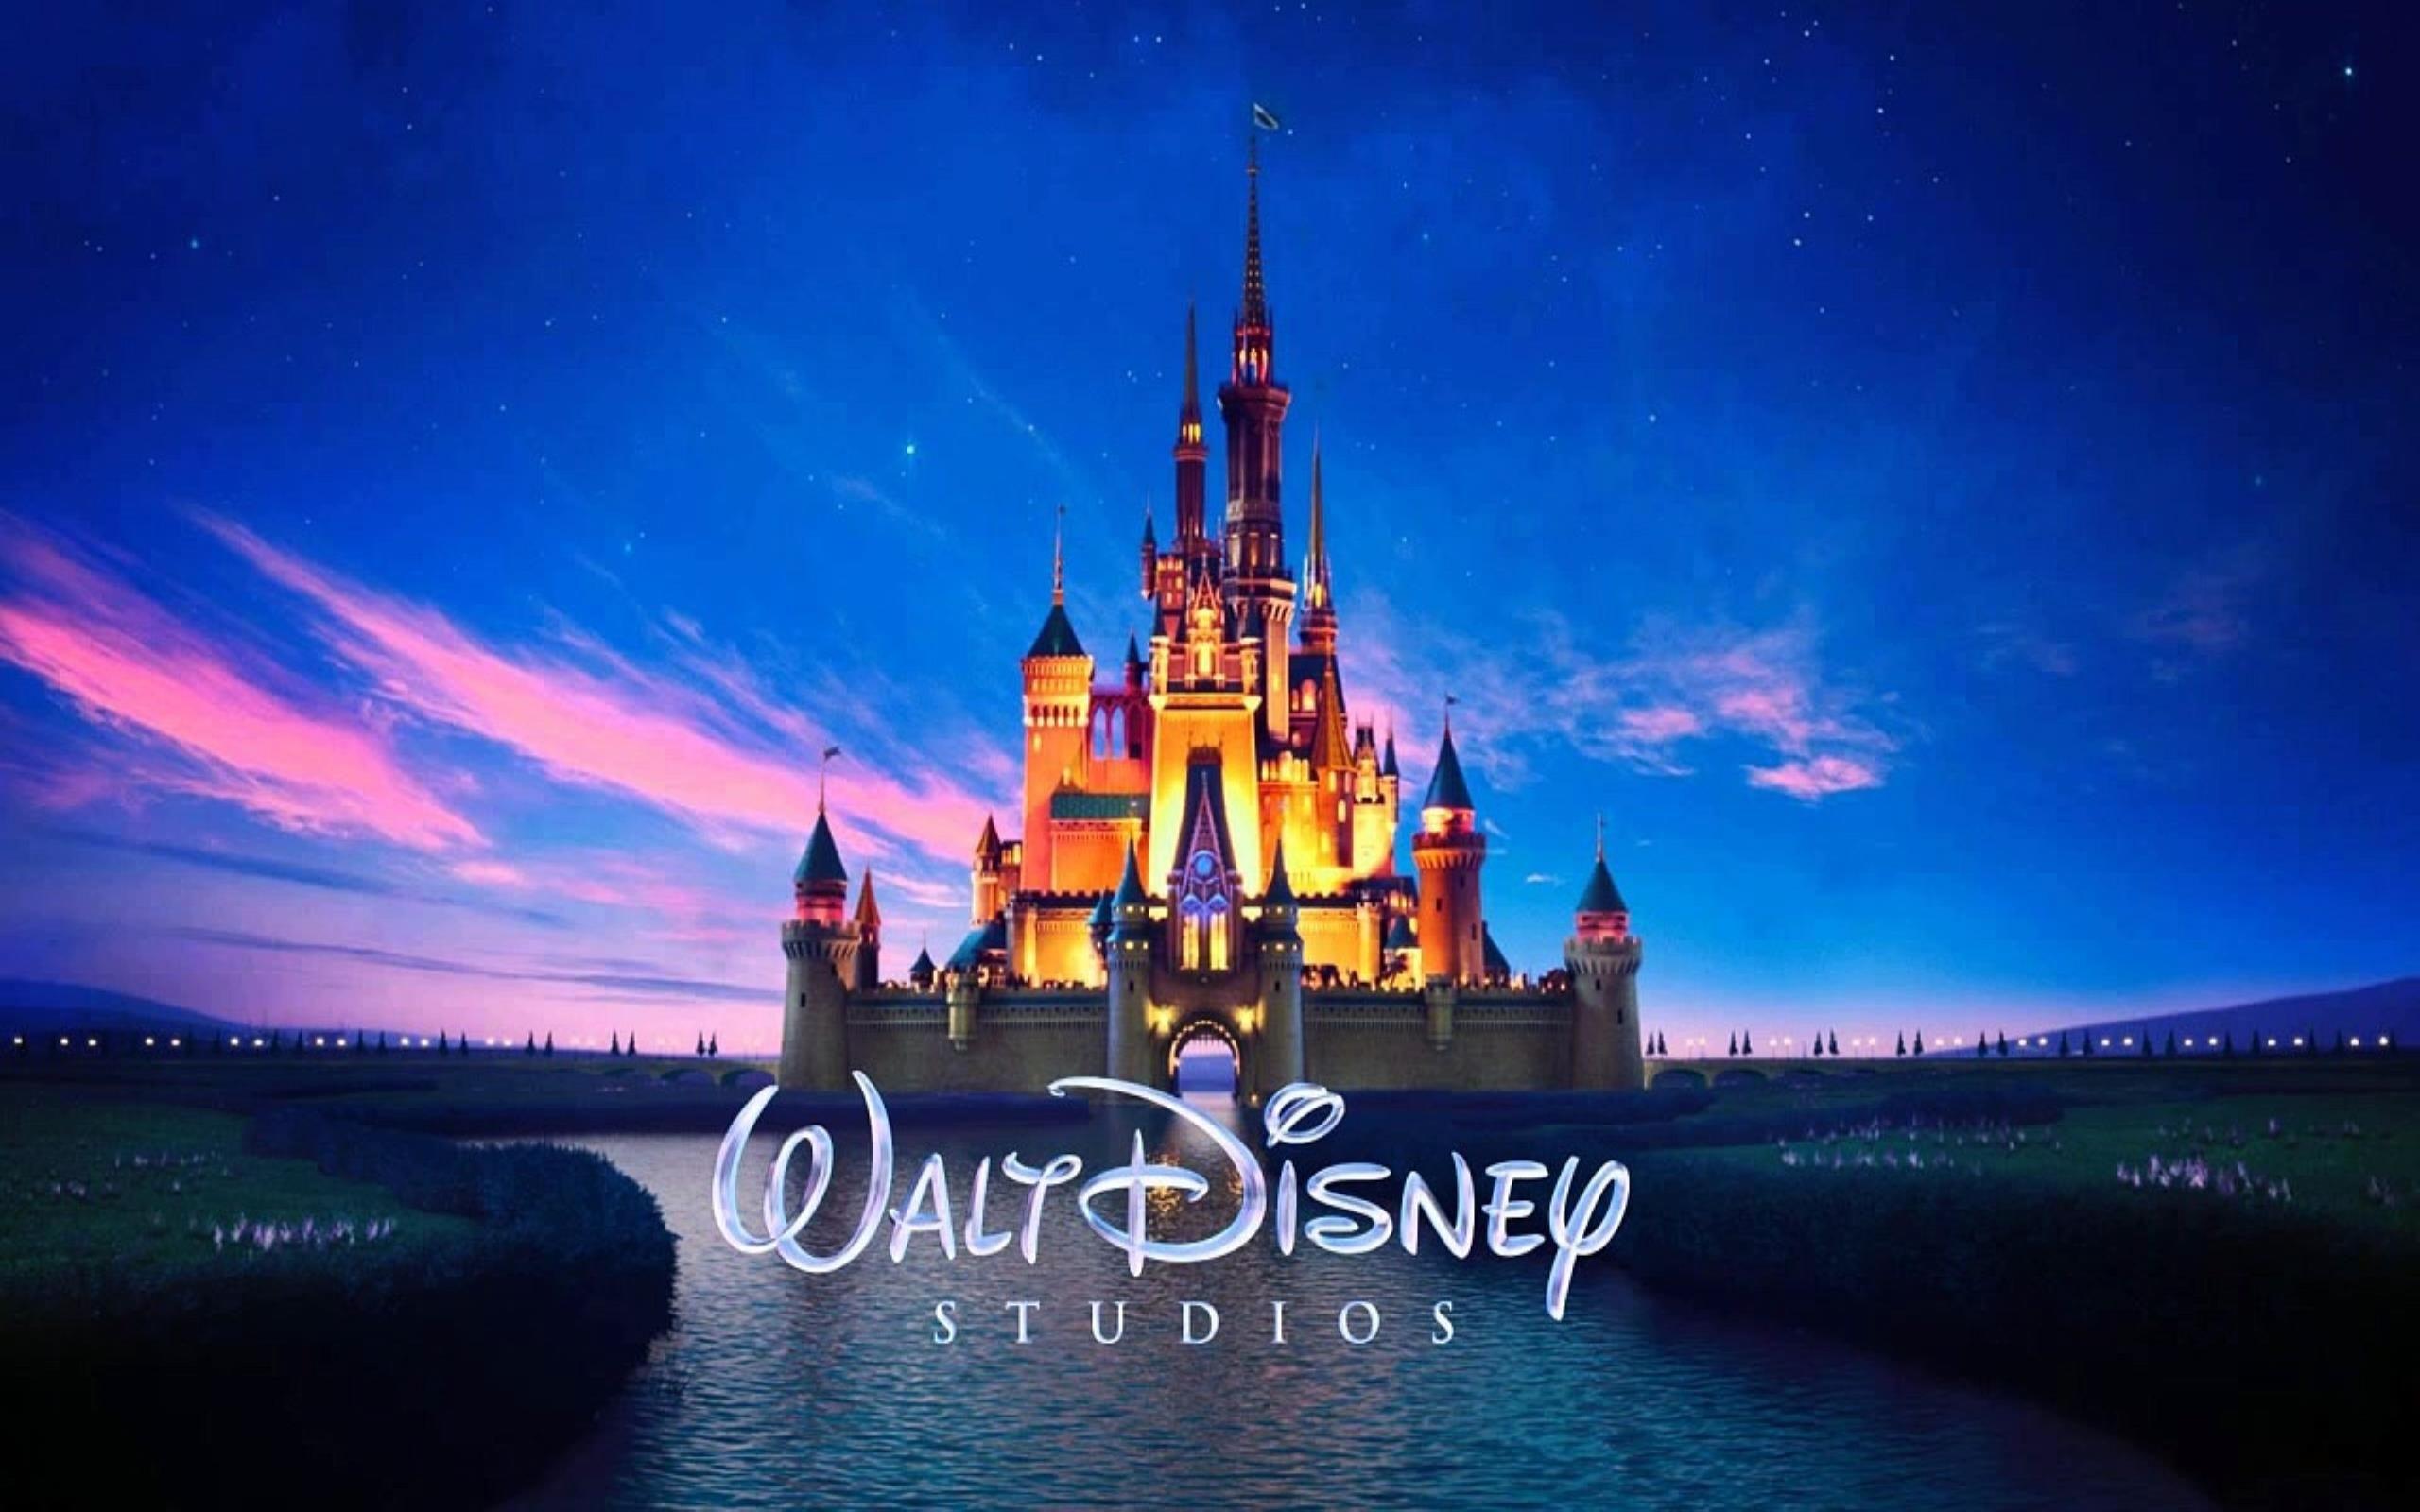 Top Wallpaper Macbook Disneyland - e7b6fe477397761a2e5933238002fed0  Gallery_23082.jpg